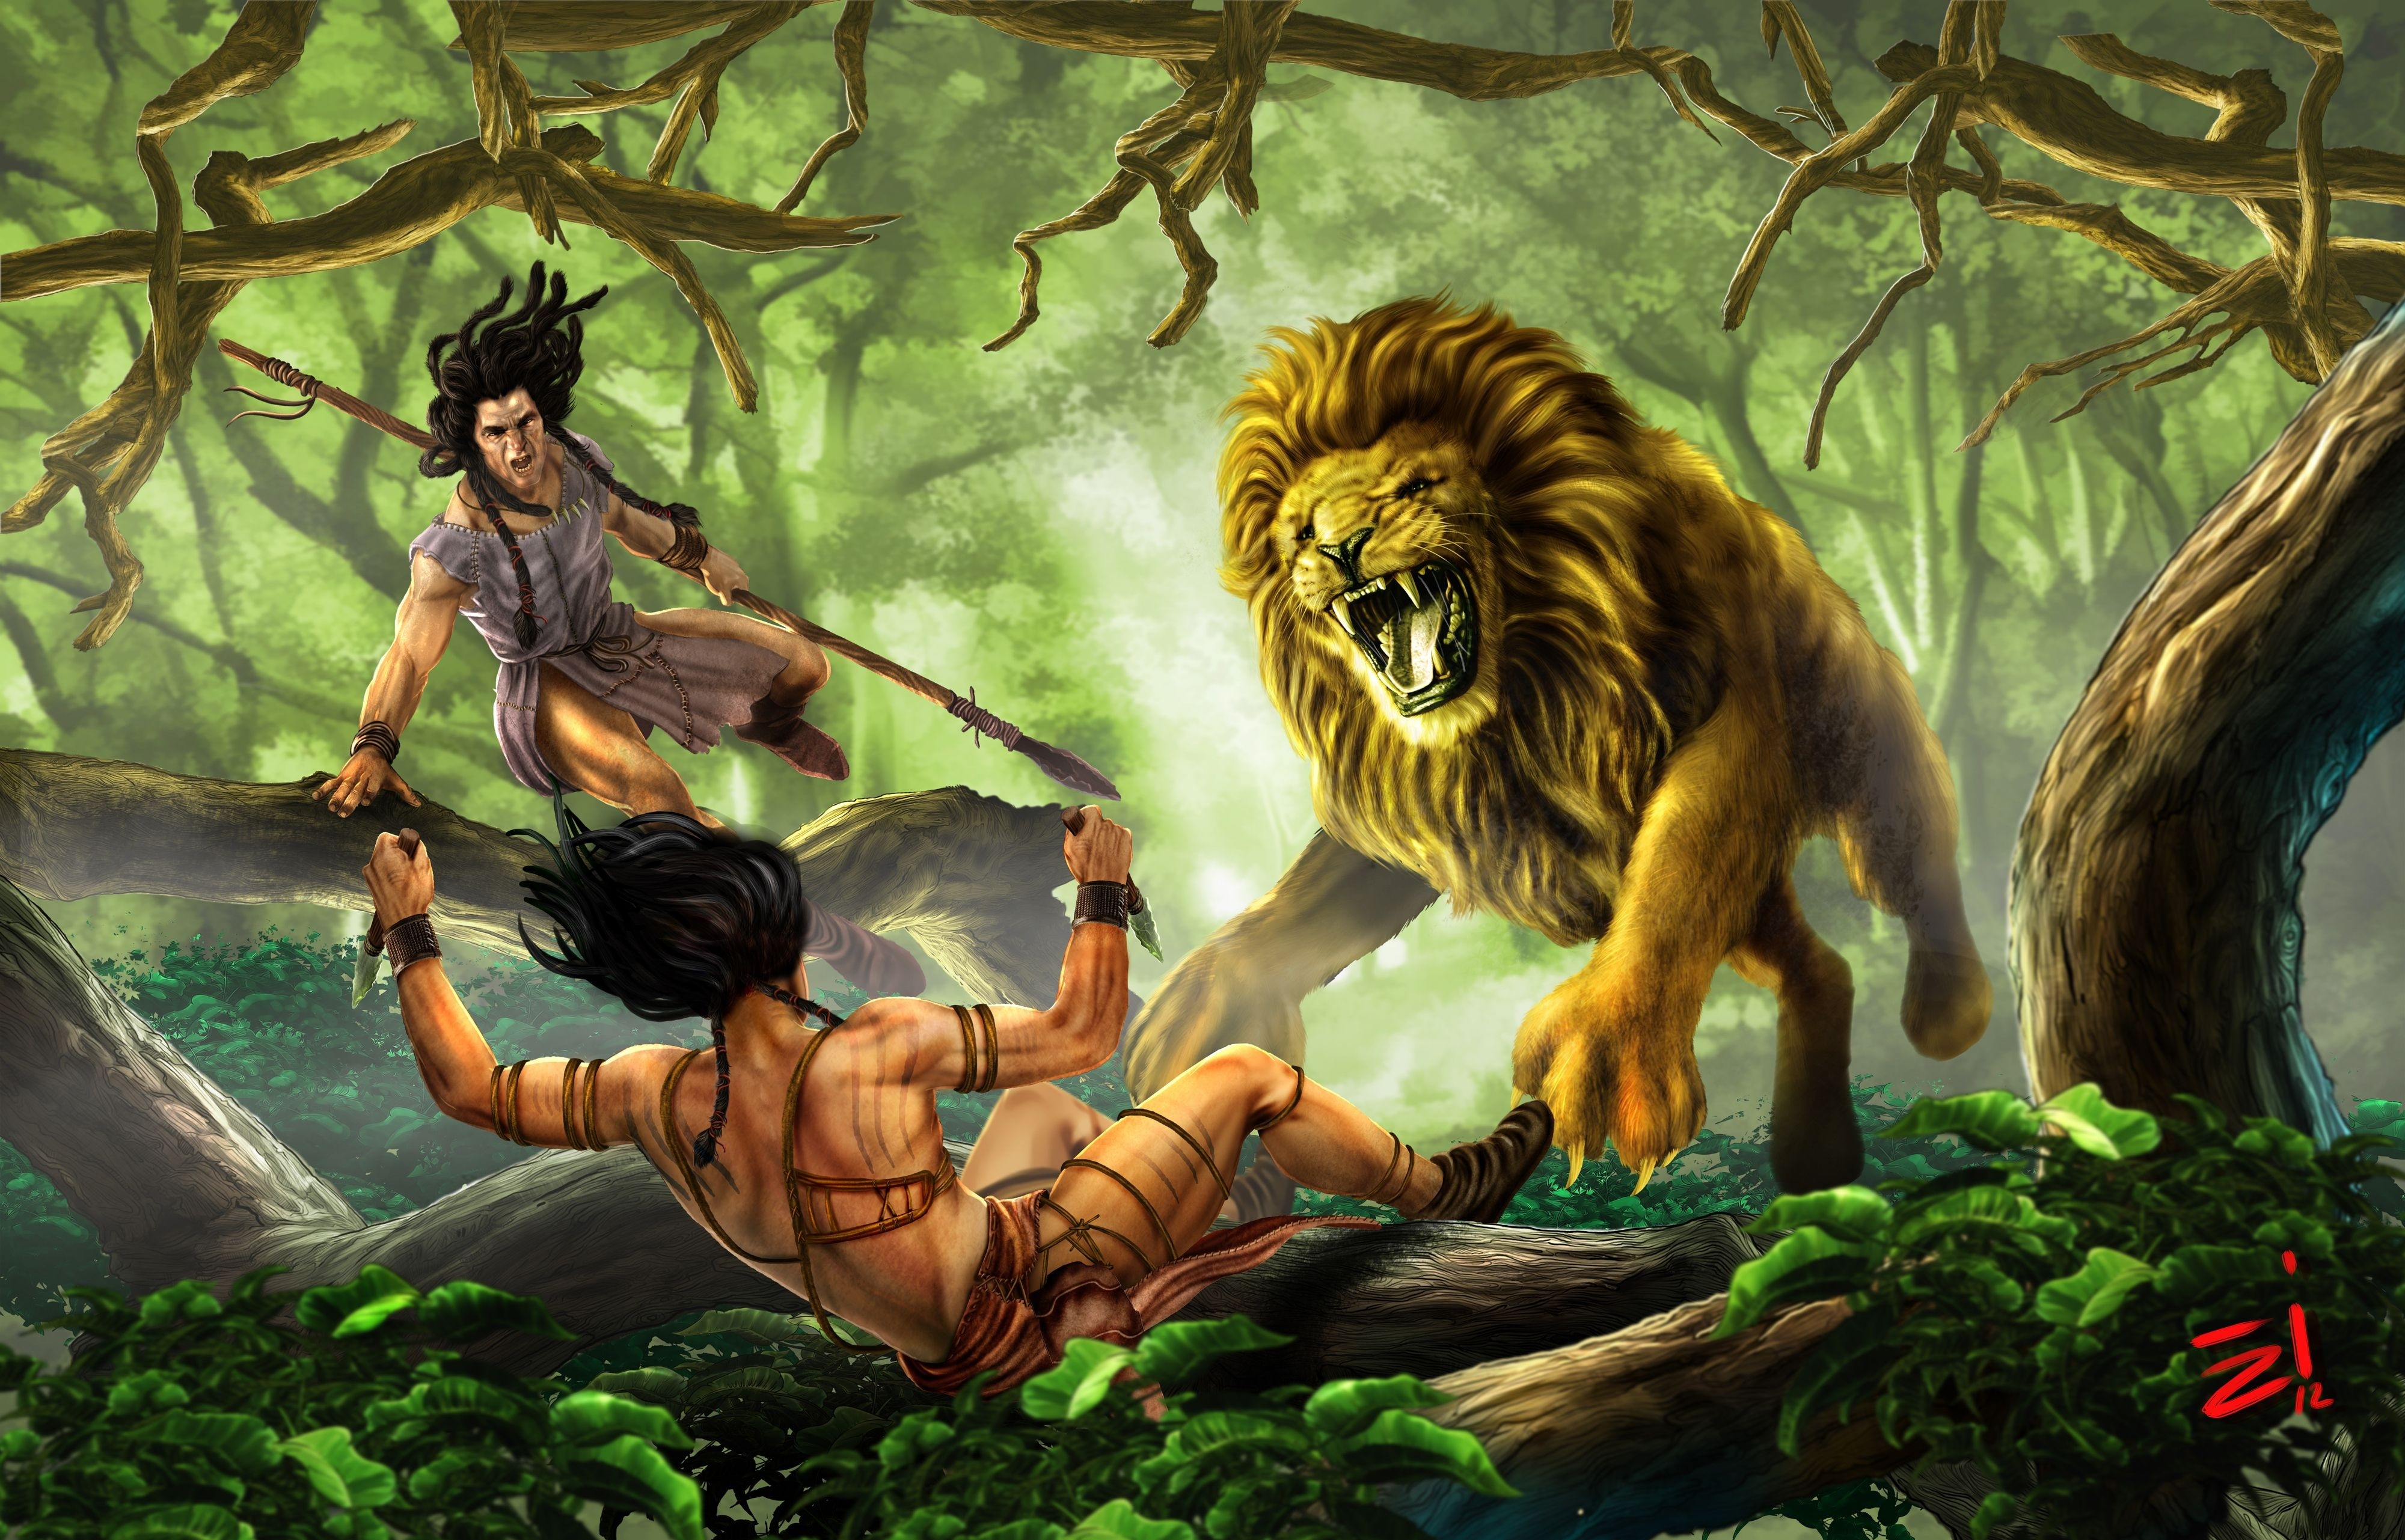 lion warrior battle k wallpaper backgroundLion Warrior